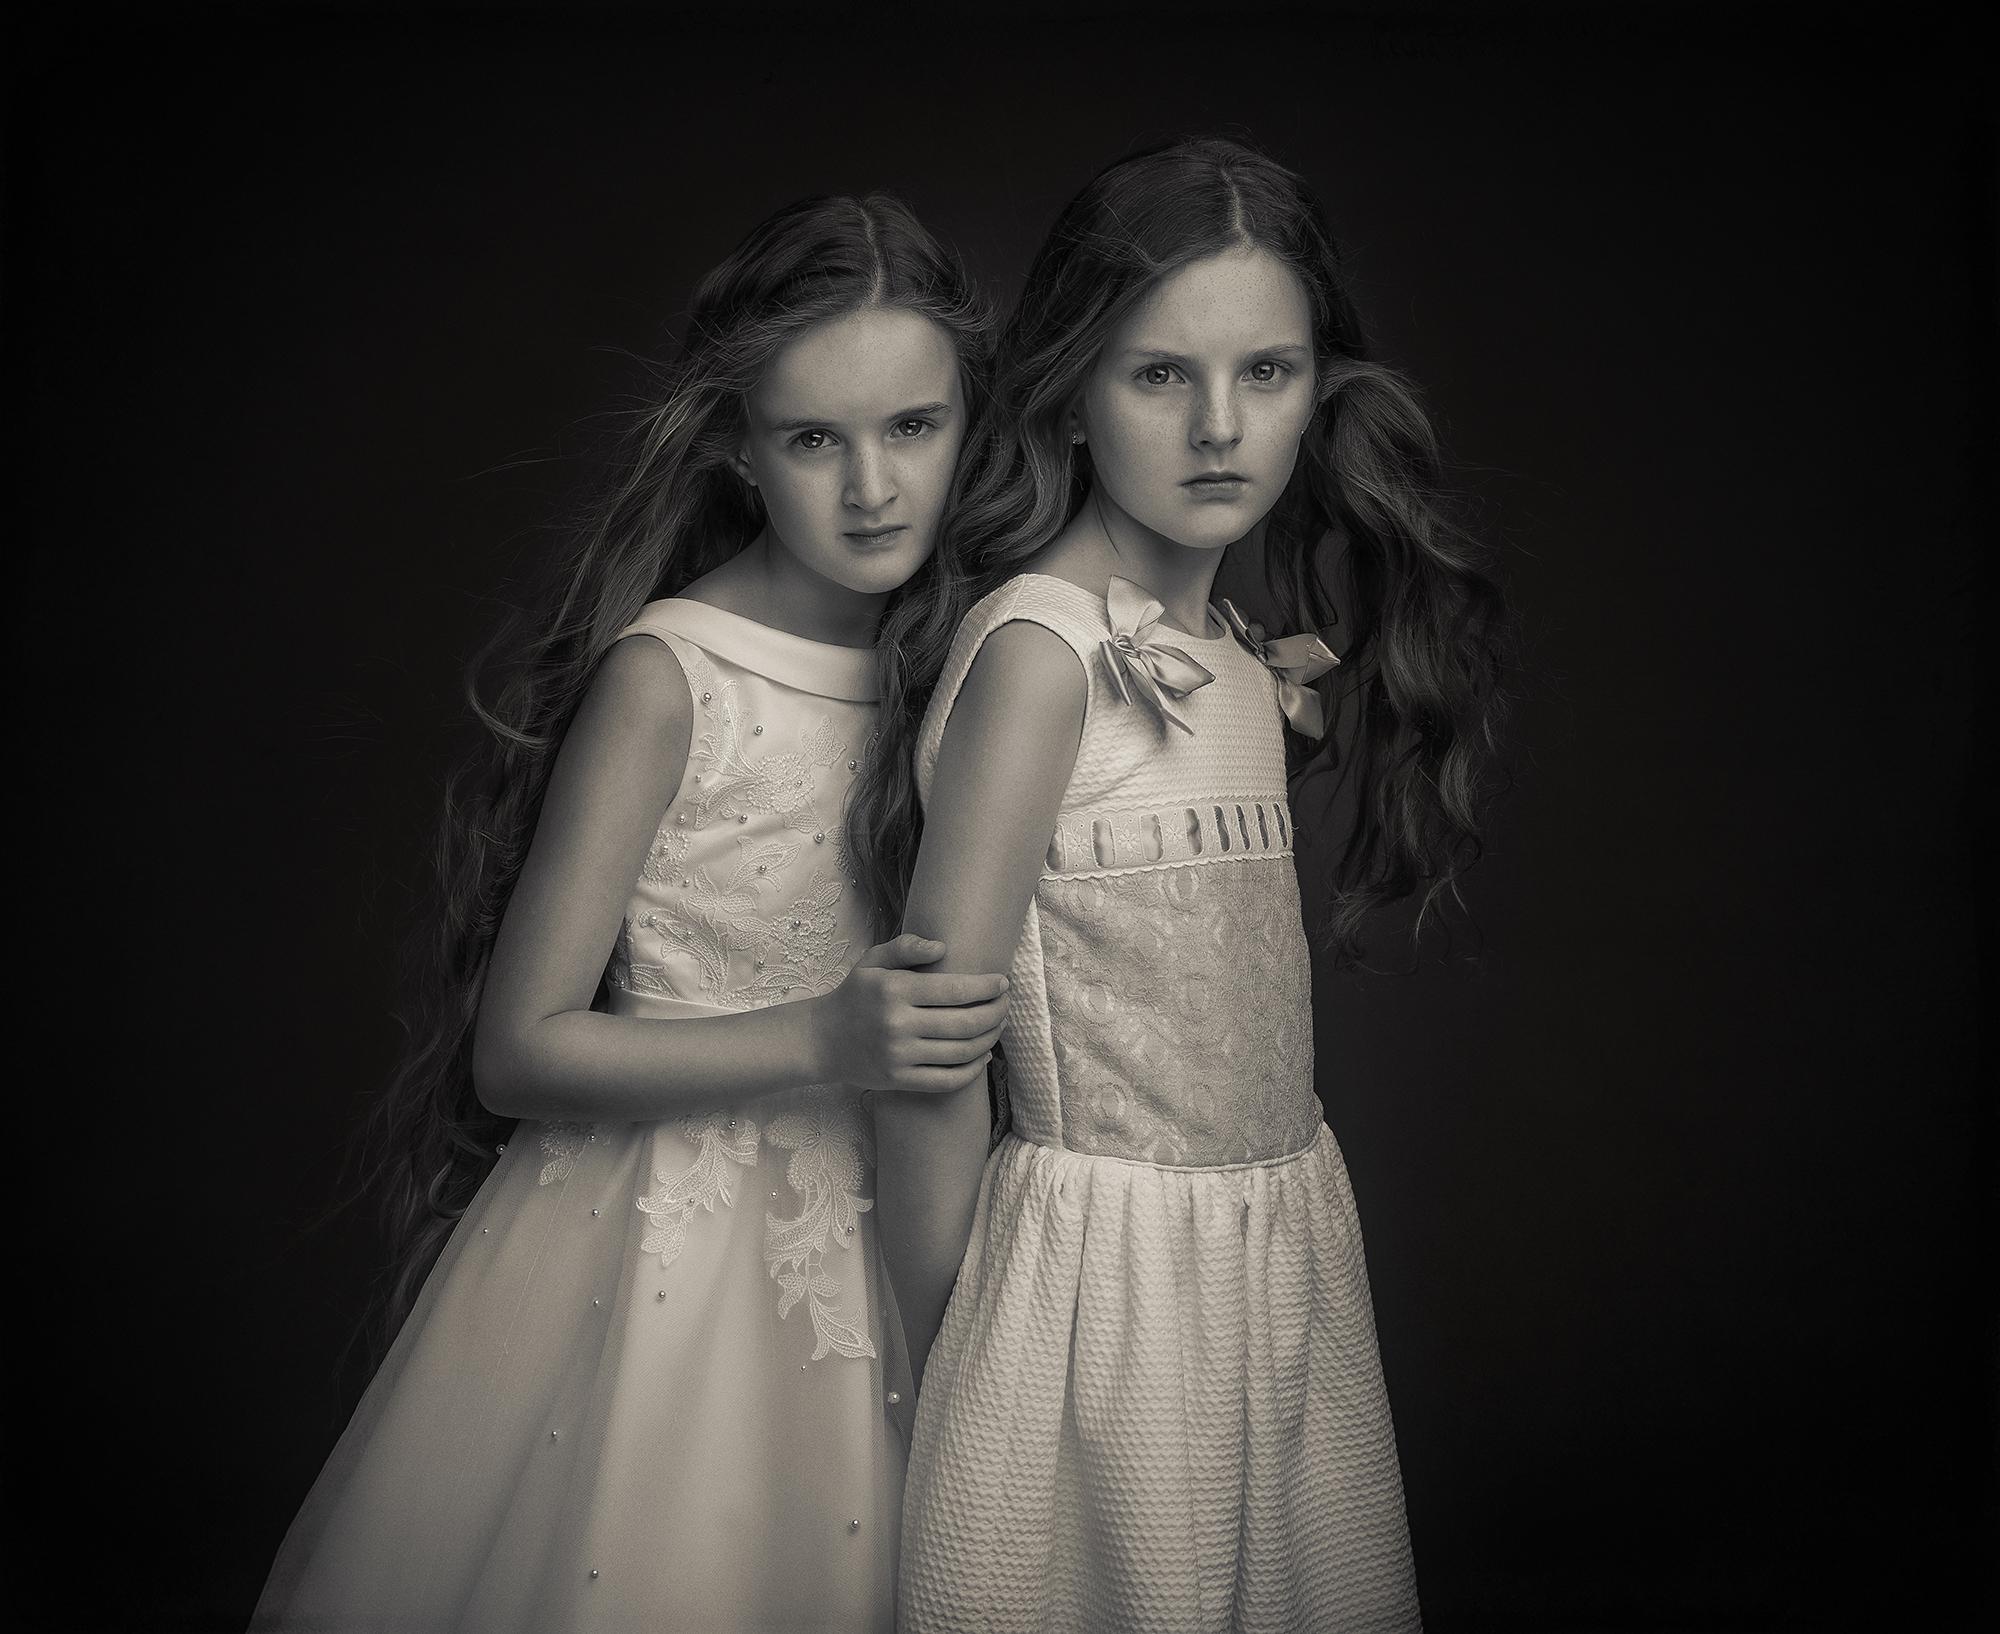 Mustafa_Oymak_Portrait studio_October_N.Ireland_2017_100583.jpg